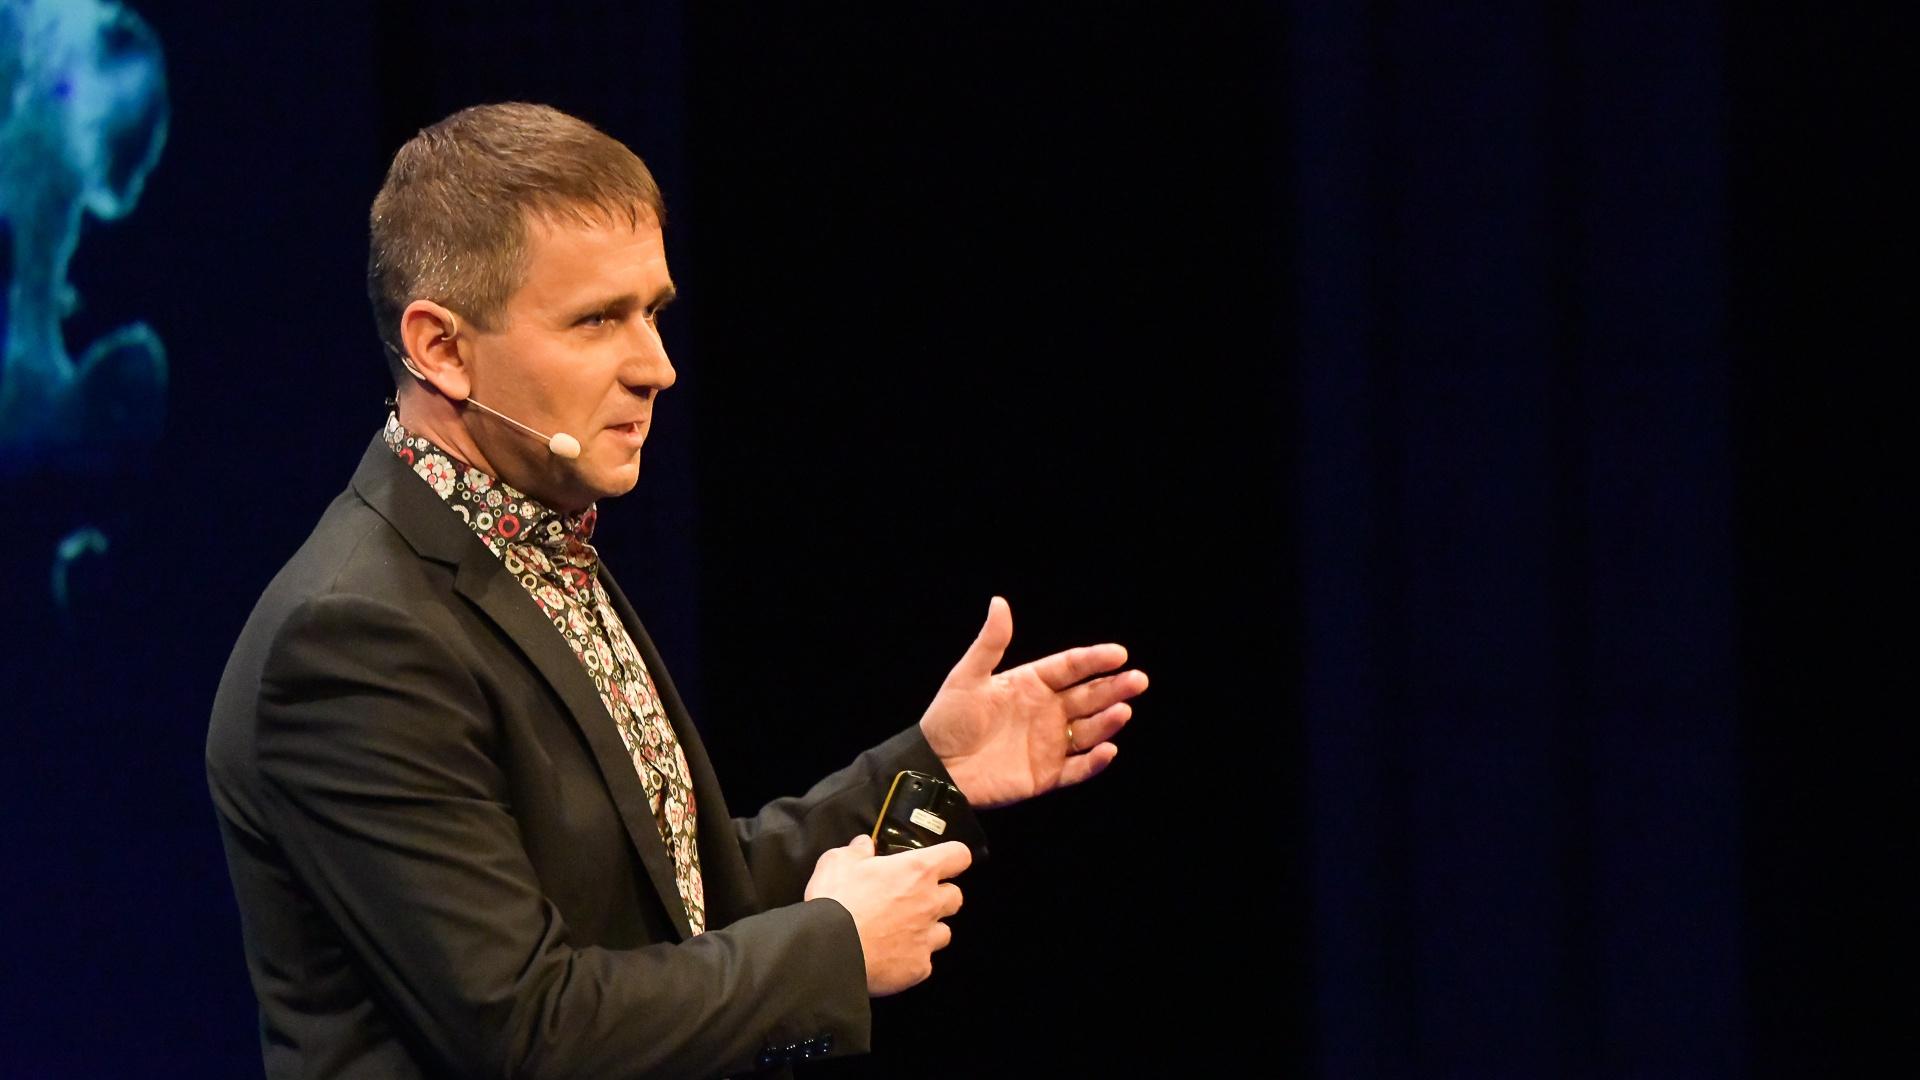 Petr Schaffartzik - Keynote konference K2 luna